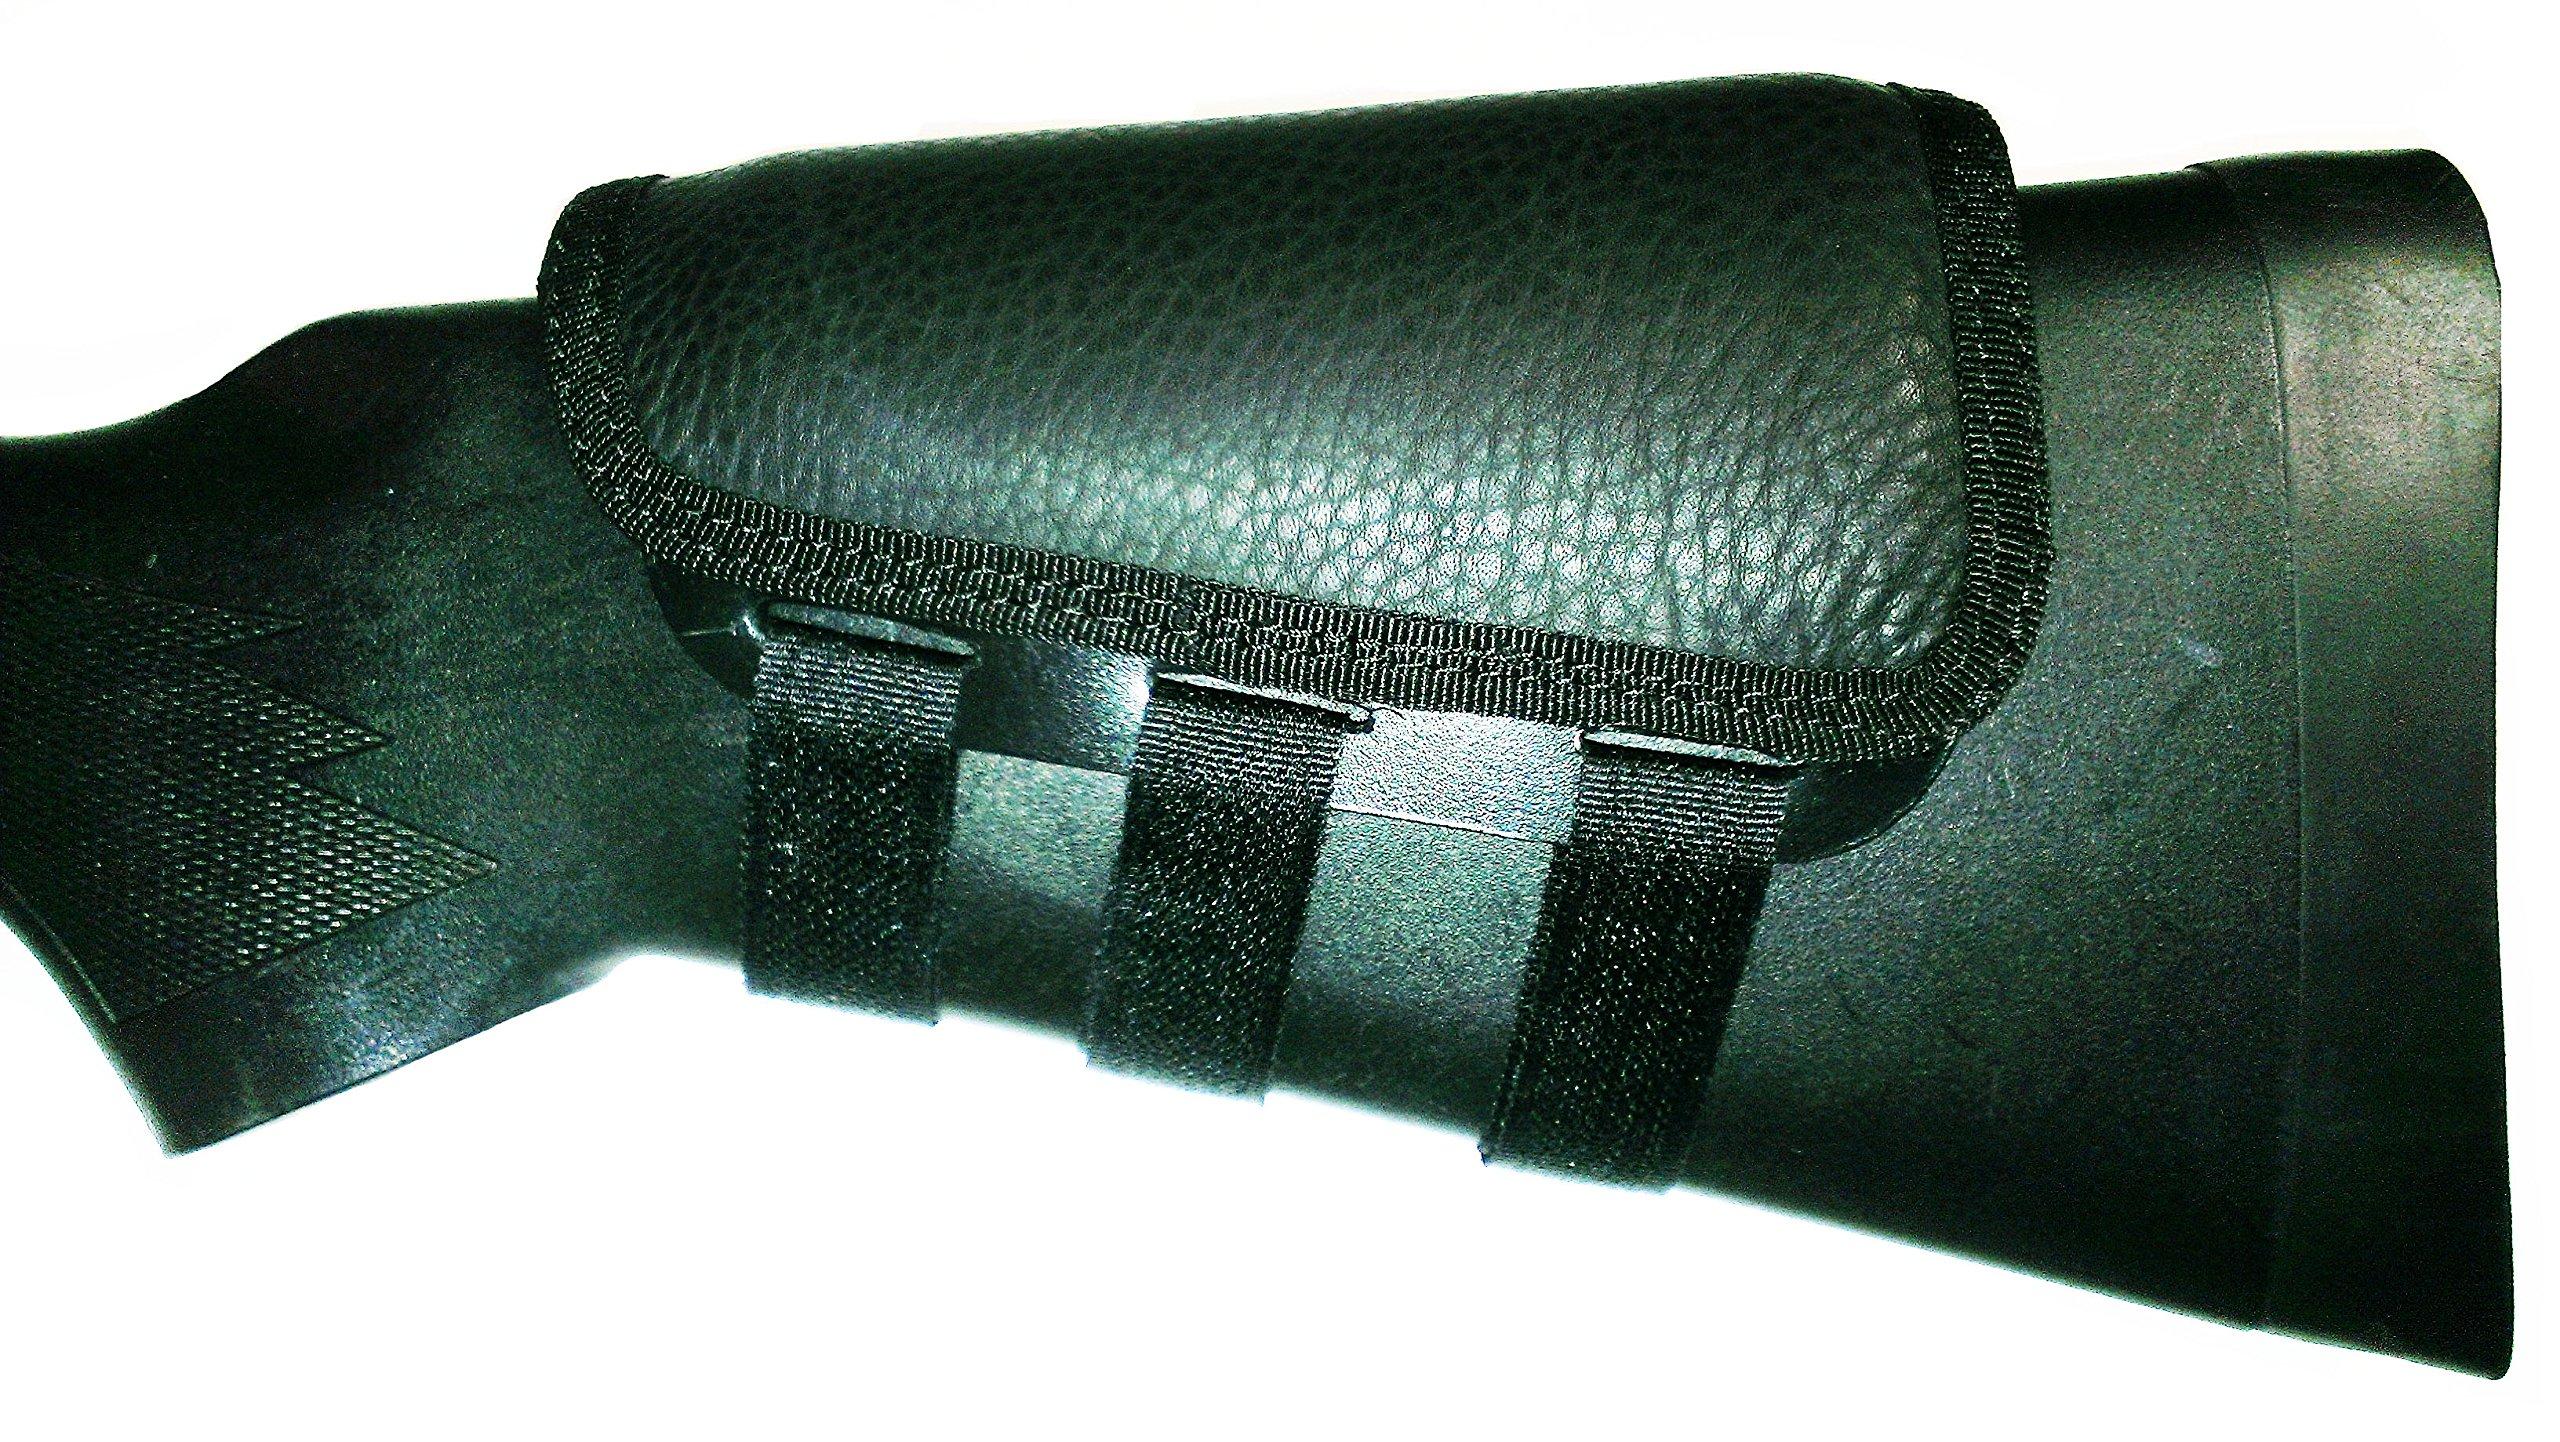 Rifle Cheek Pad / Cheek Riser / CheekRest by ITC Marksmanship / Black Leather by ITC